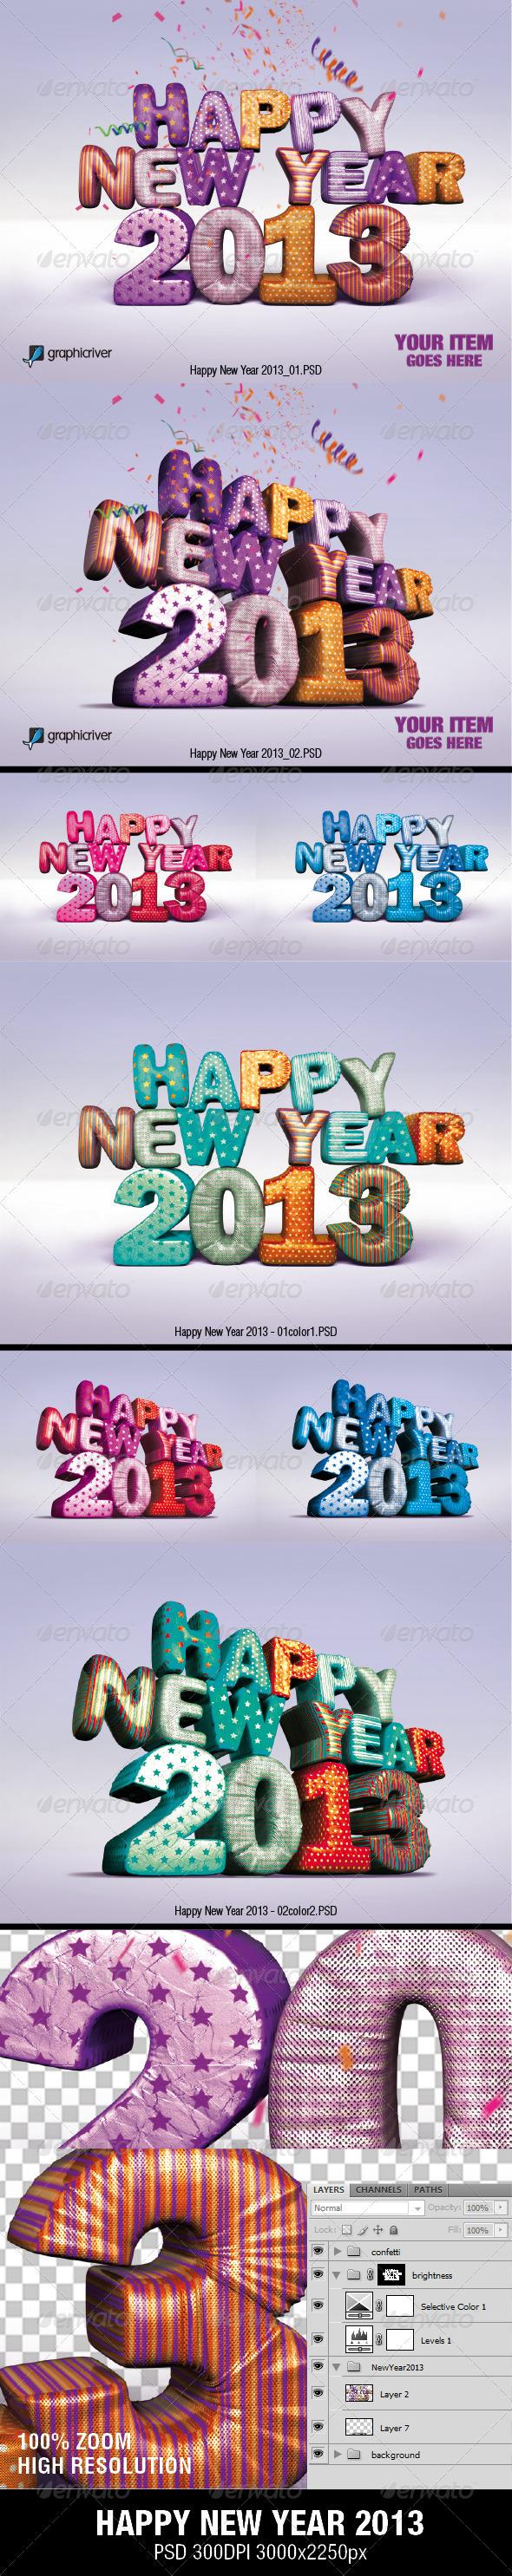 GraphicRiver HAPPY NEW YEAR 2013 3102001